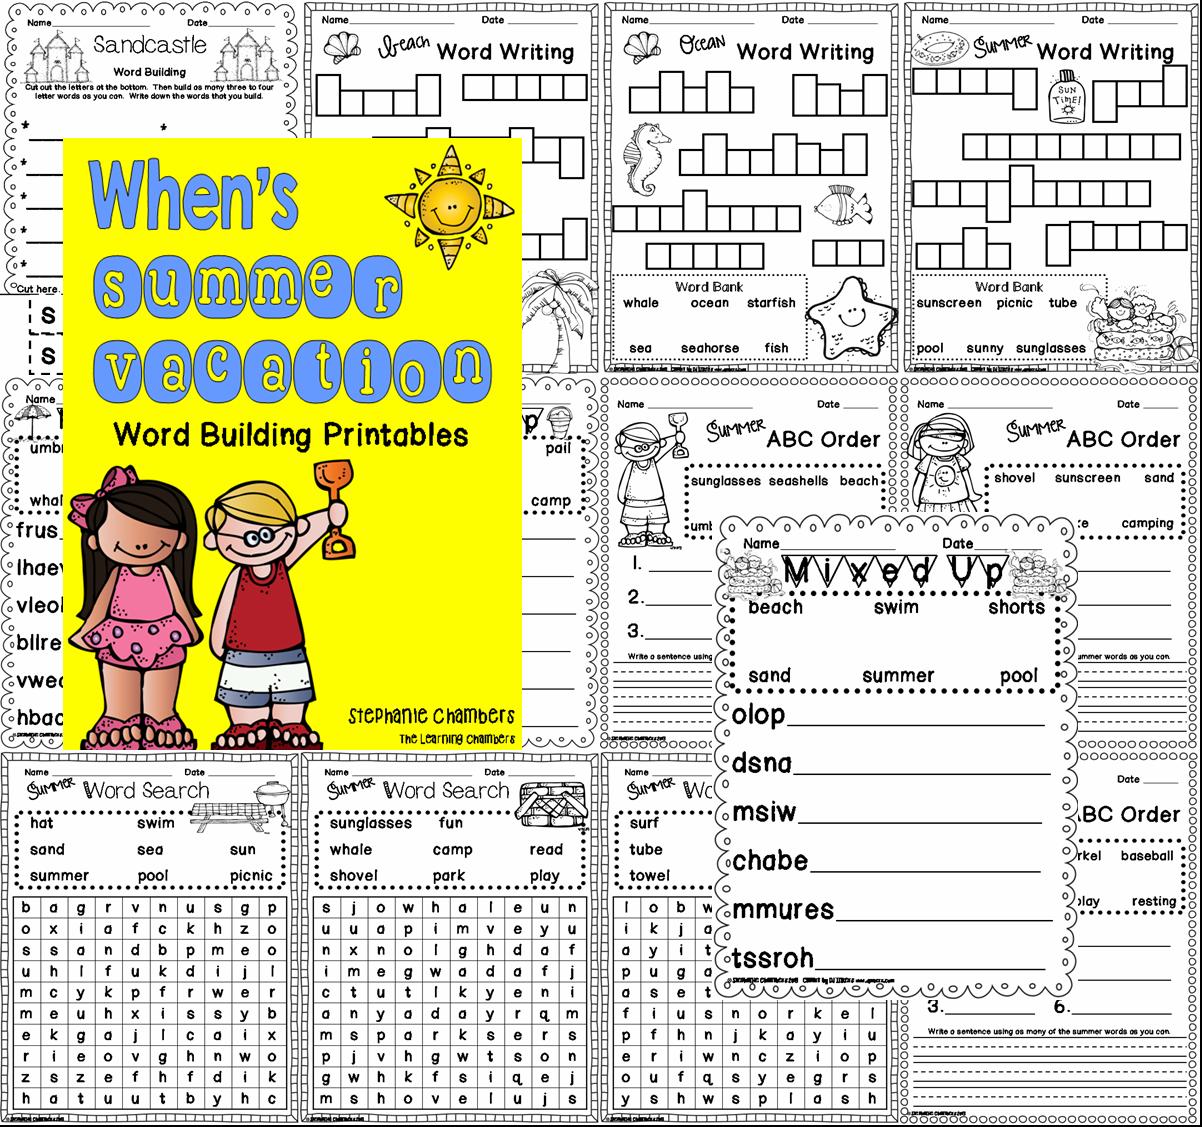 http://www.teacherspayteachers.com/Product/Whens-Summer-Vacation-Word-Work-Printables-692340